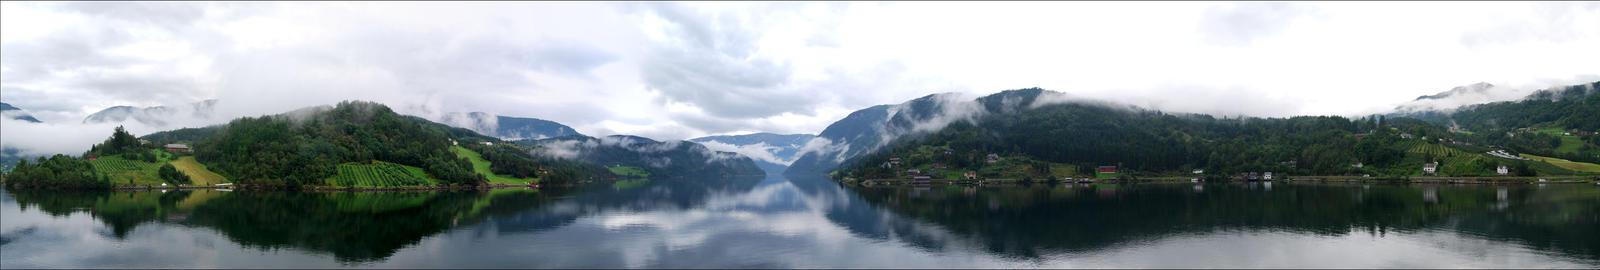 Ulvik, Norway by alaarch